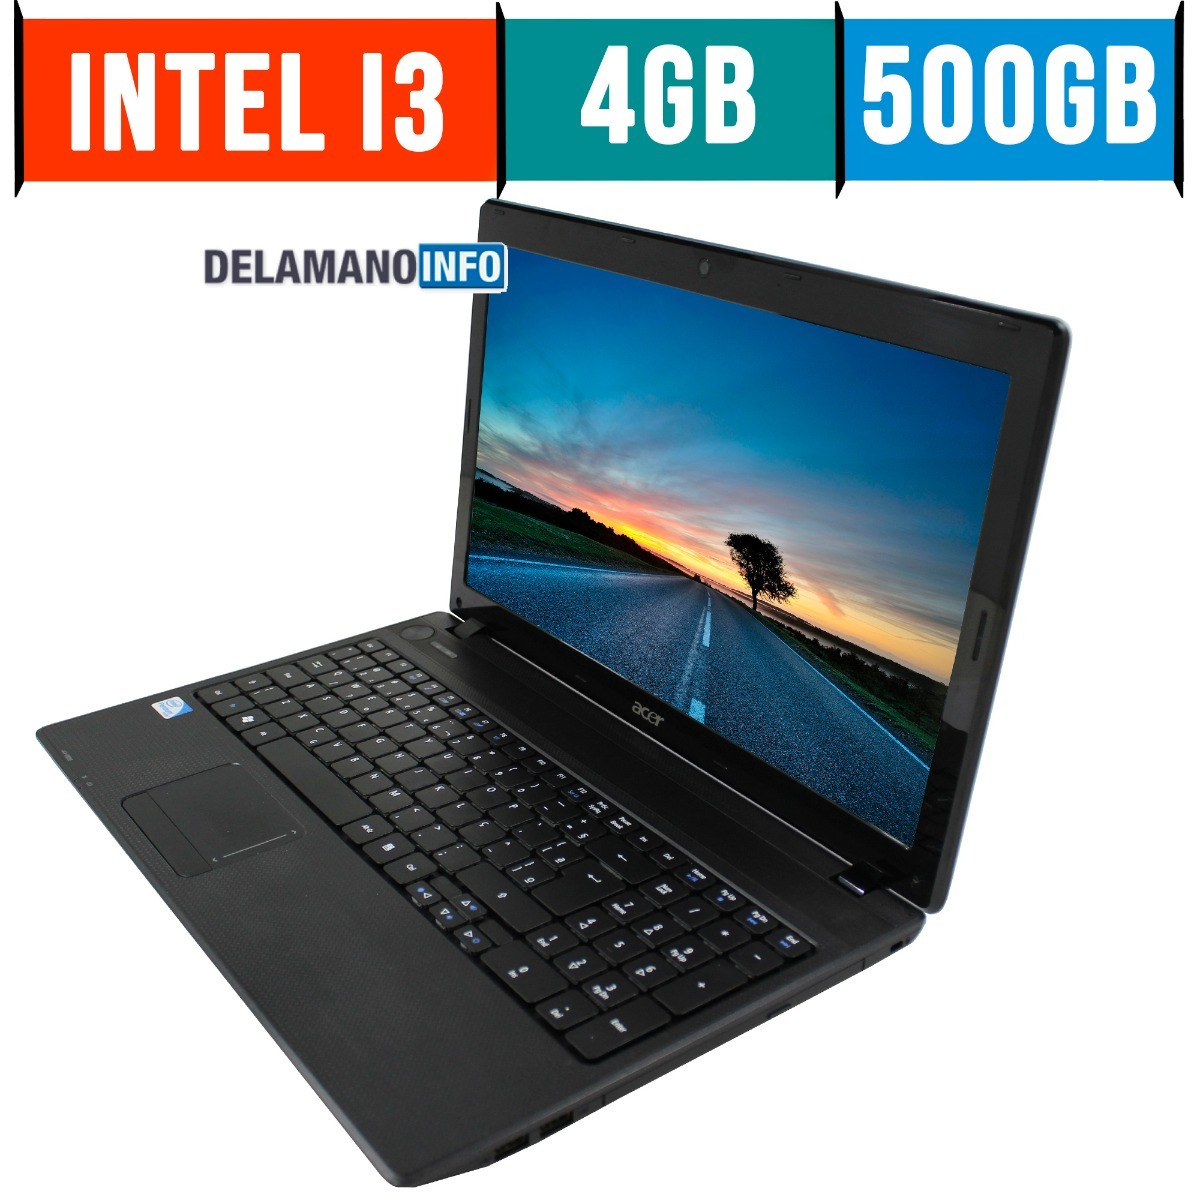 Acer Aspire 5742 Notebook Intel VGA Windows Vista 32-BIT